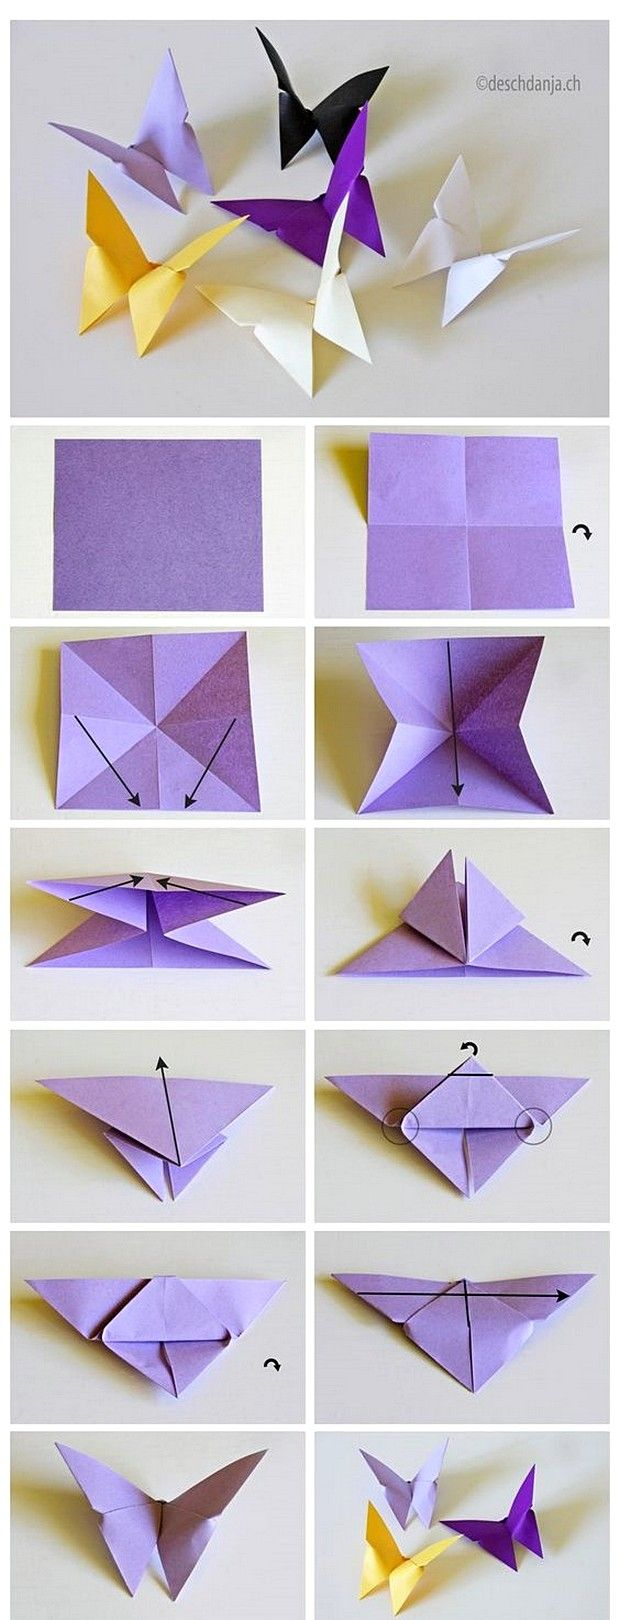 Tutorial Lengkap Membuat Hiasan Dinding R Buatan Sendiri Dari Kertas Origami Berbentuk Kupu Cantik Warna Warni